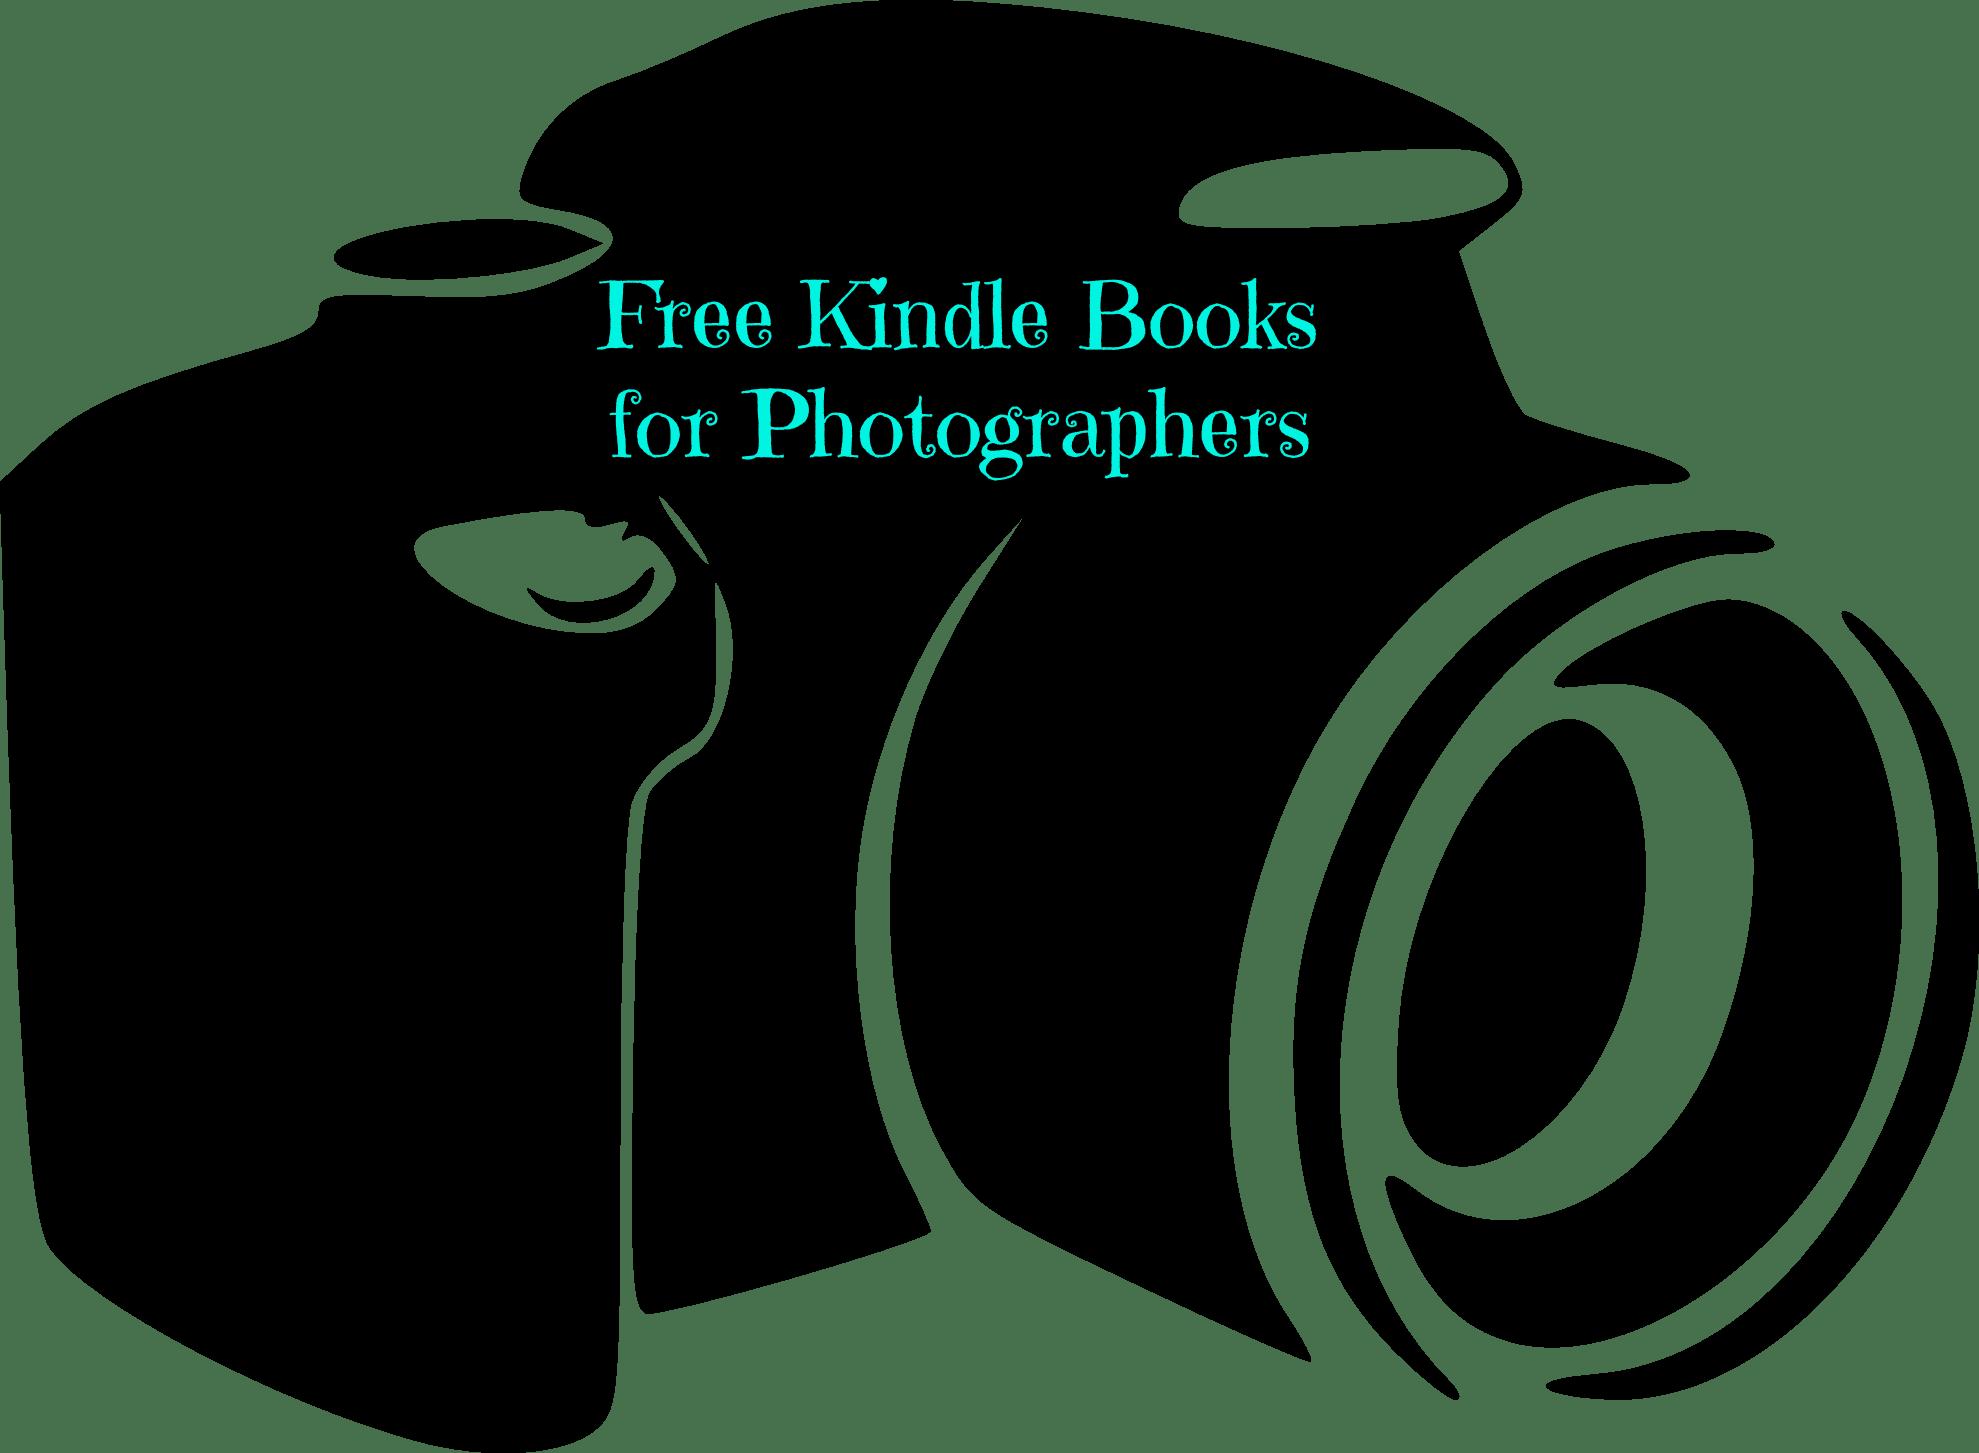 Free Kindle Books For Photographers